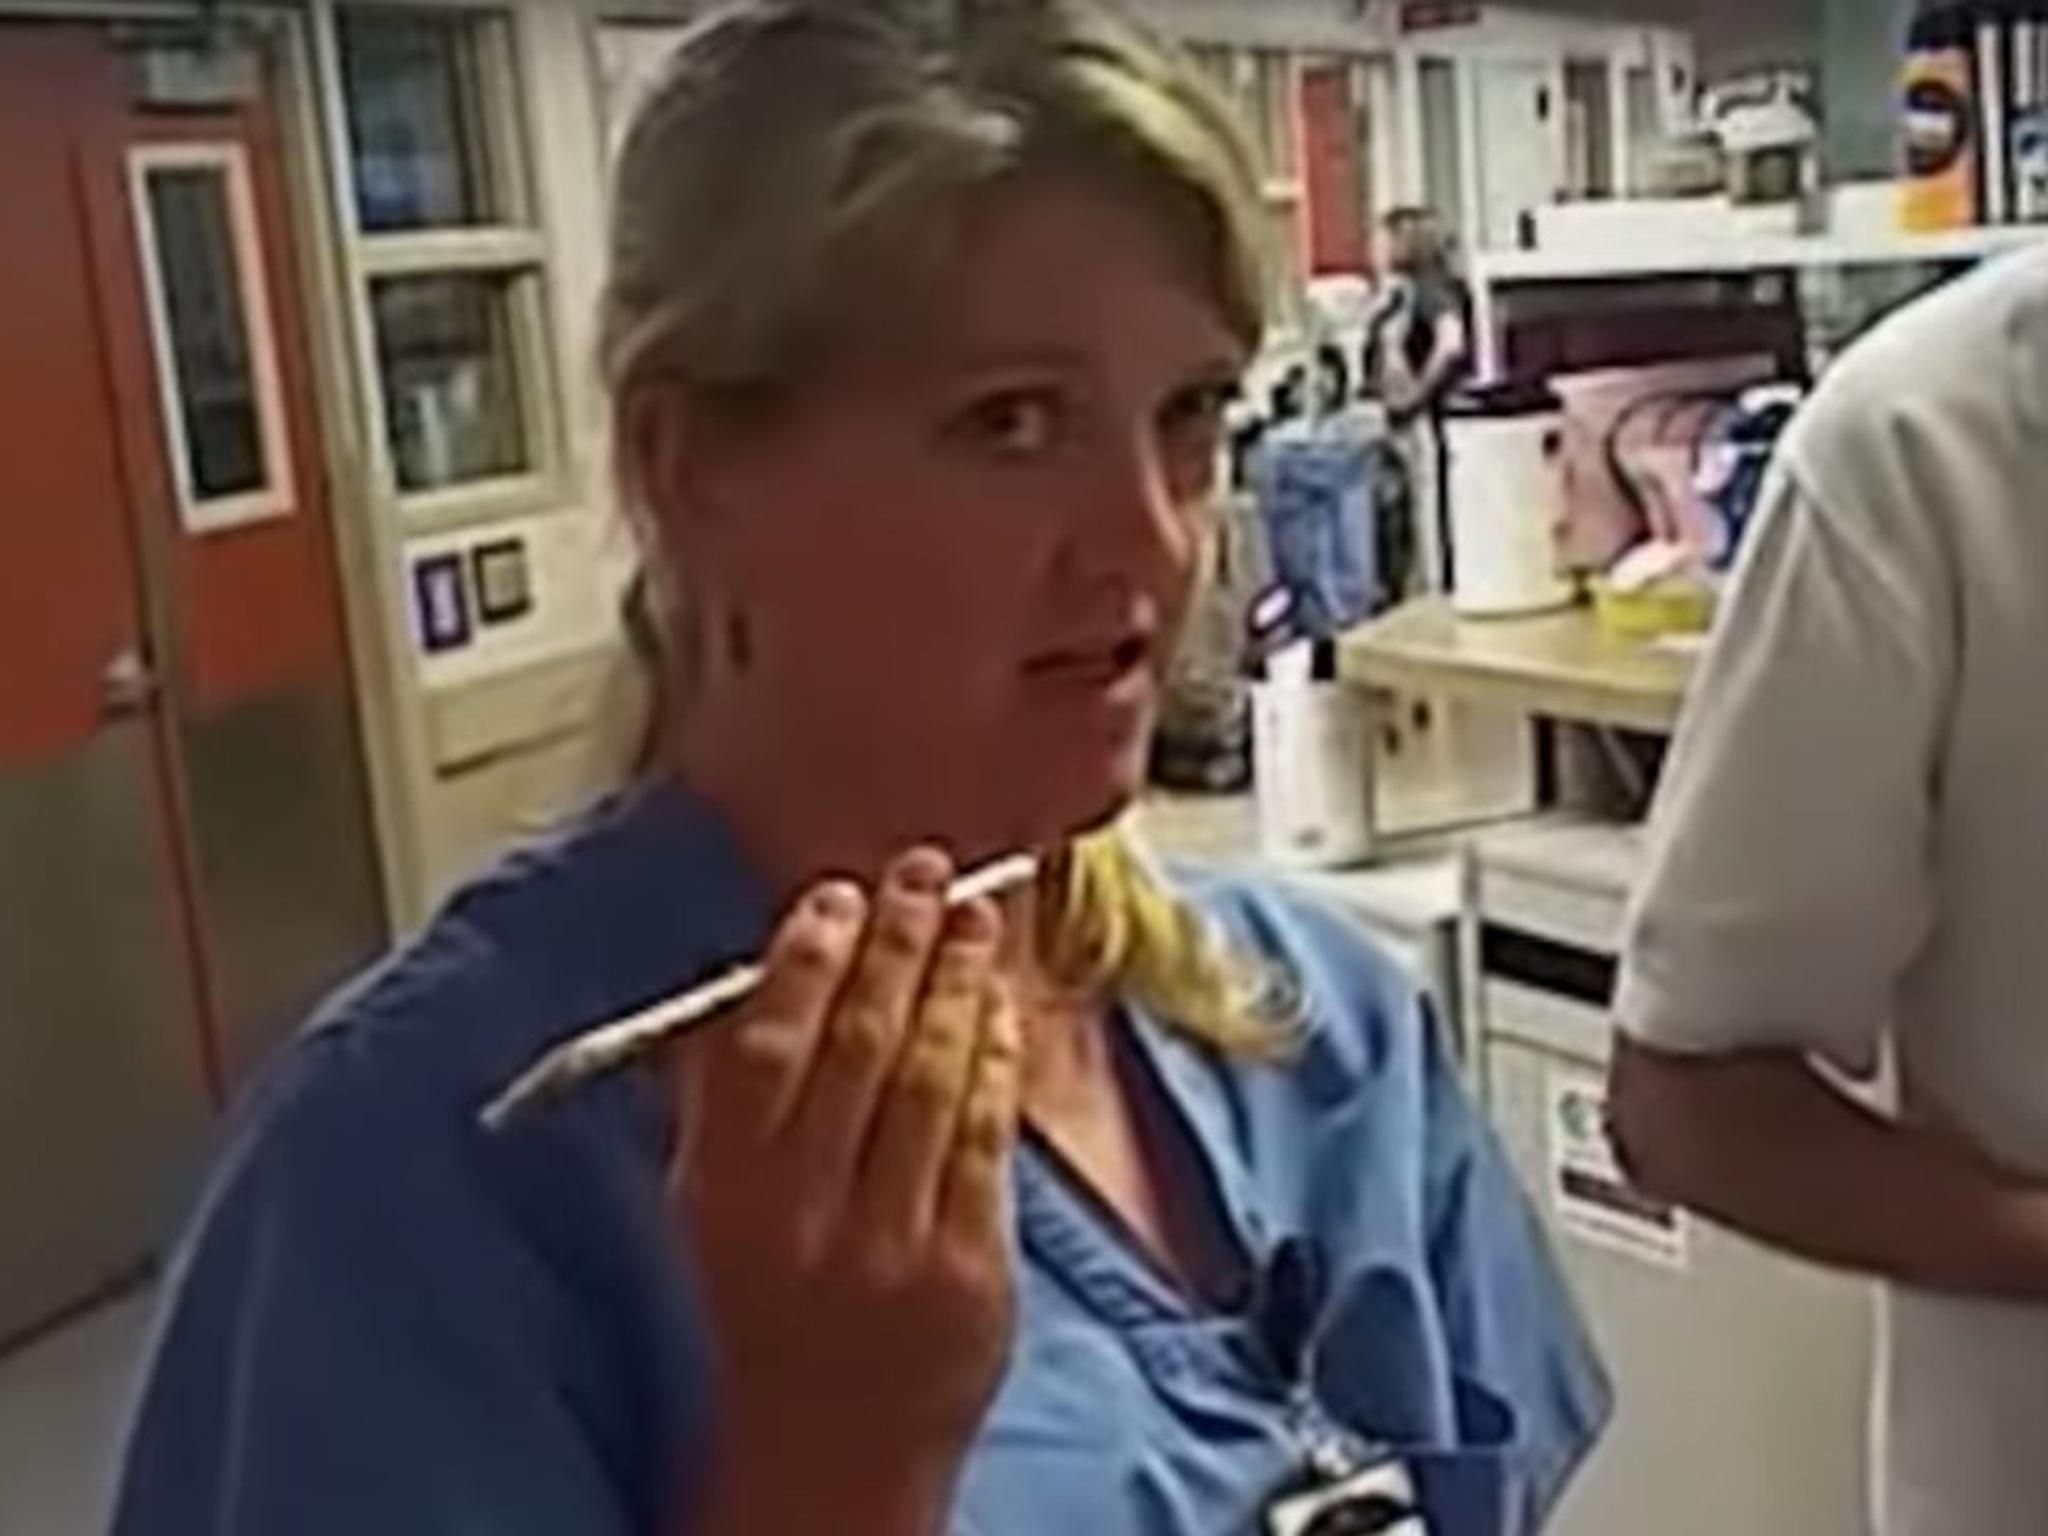 Nurses dating cops